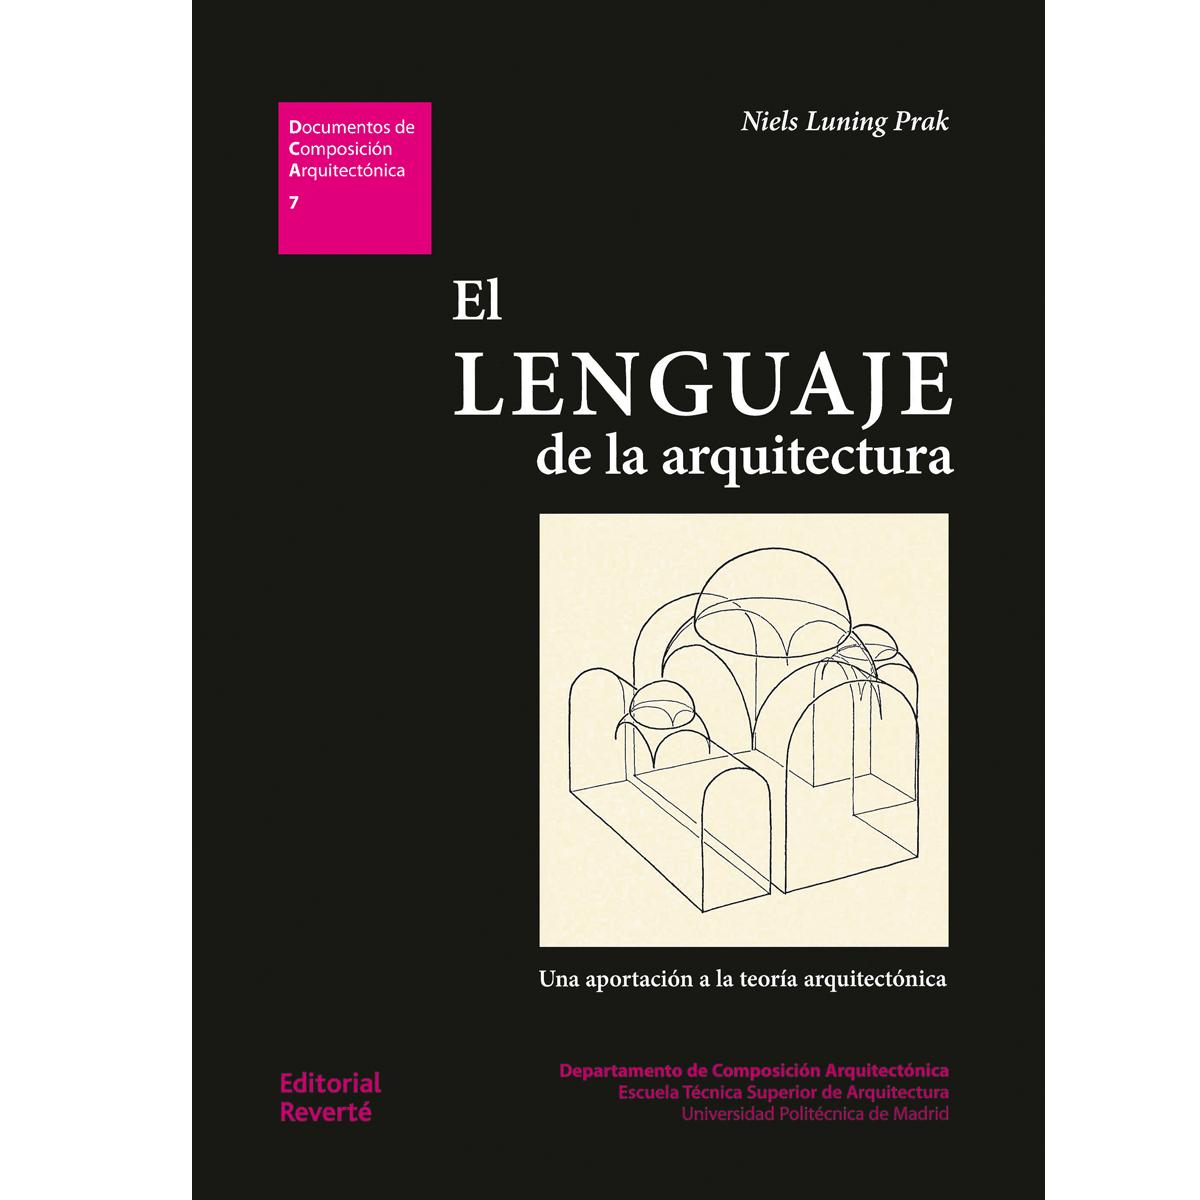 El lenguaje de la arquitectura